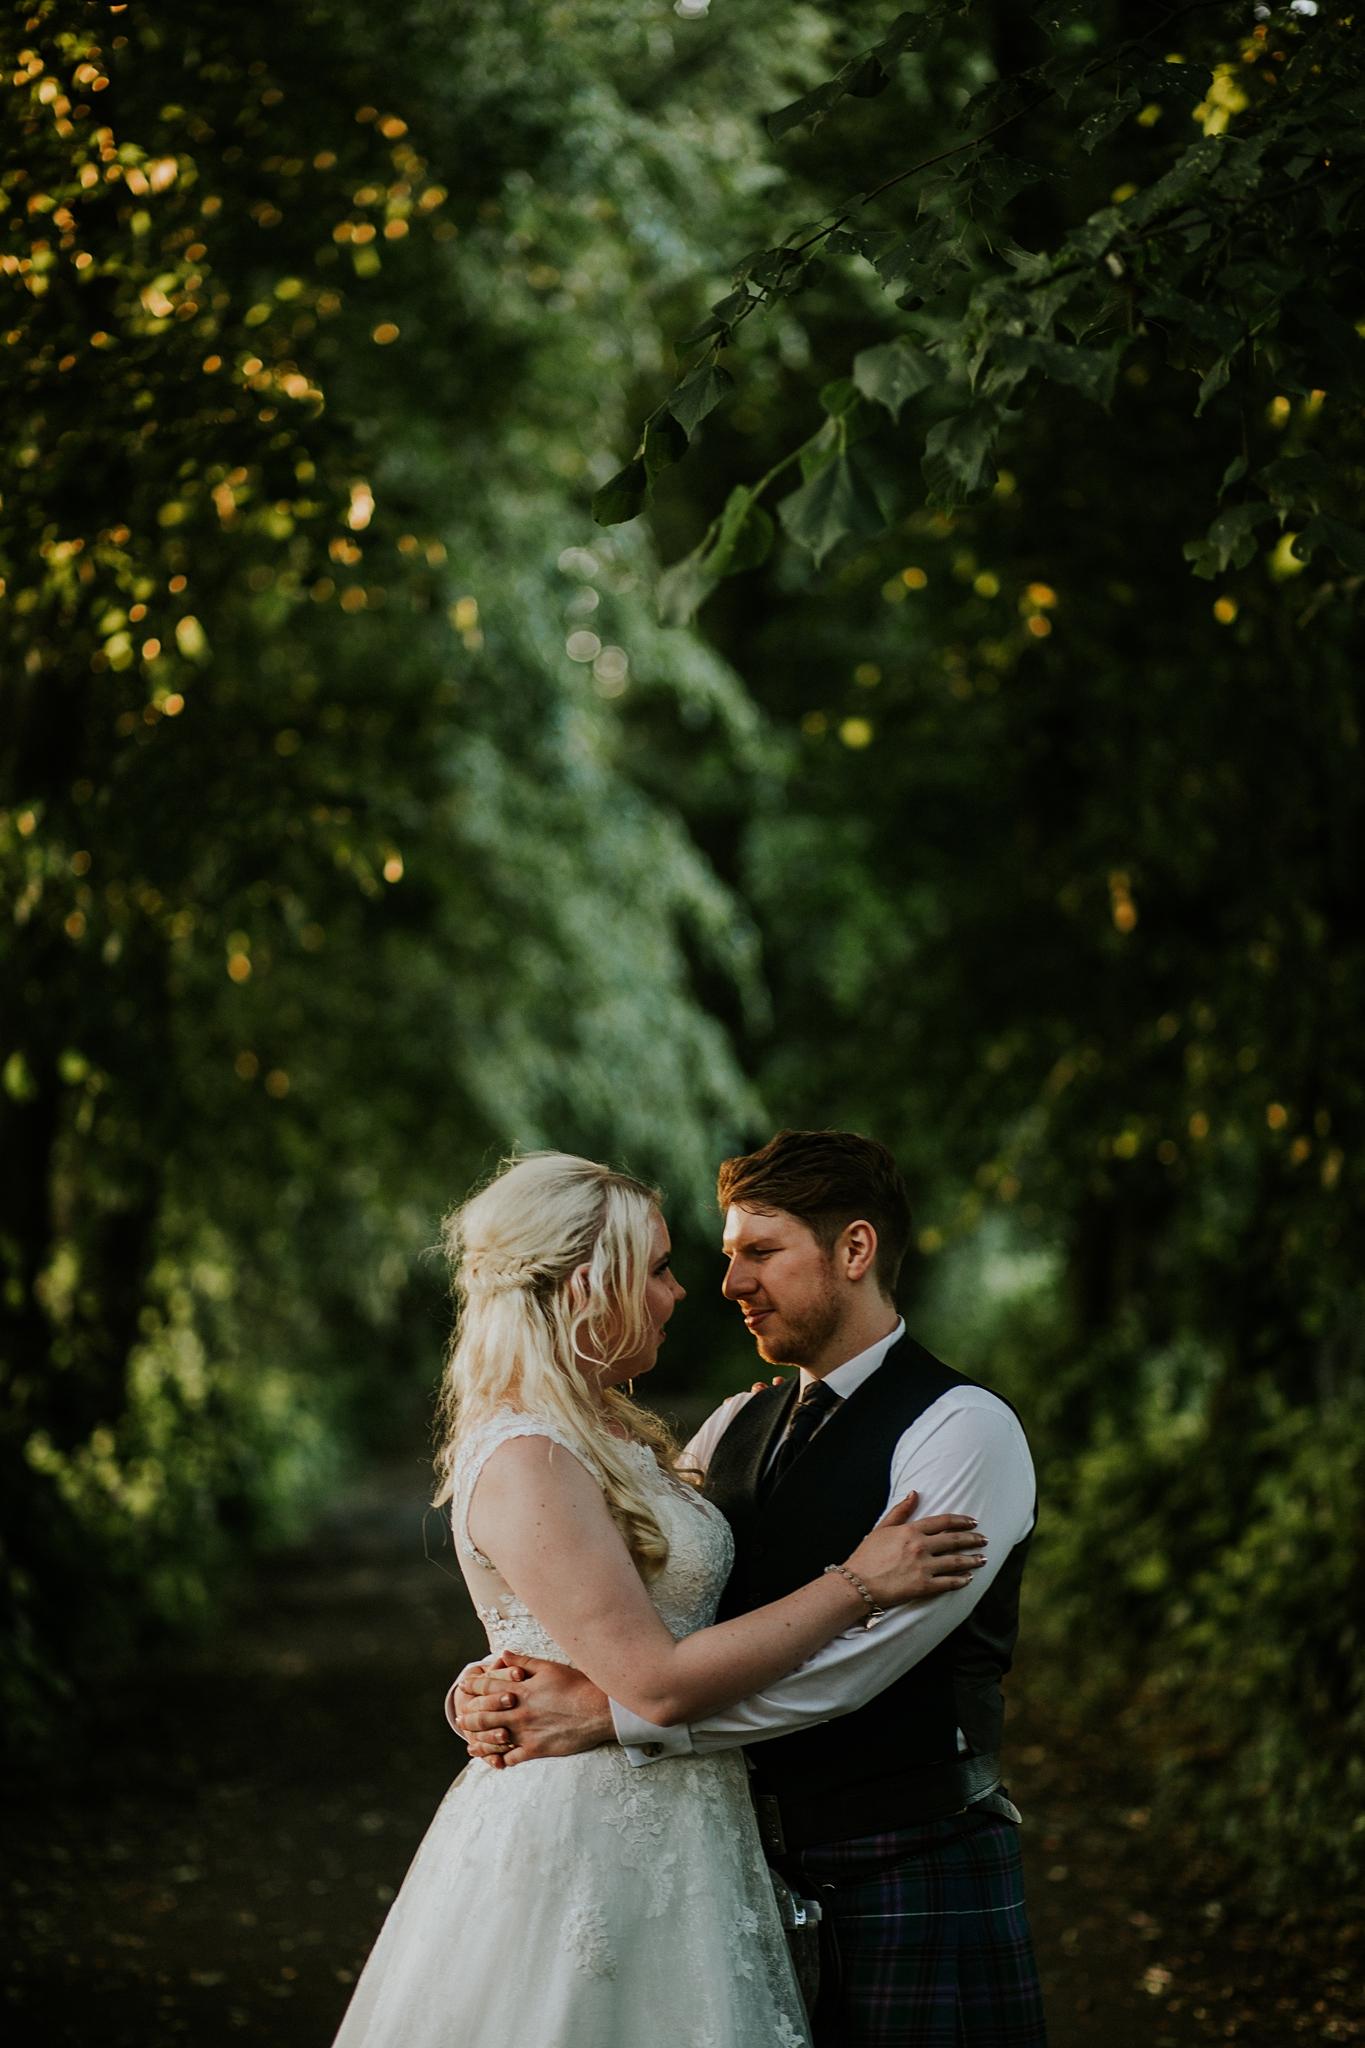 Mark_Alison_Pollockshields_Burgh_Hall_Wedding-49.JPG